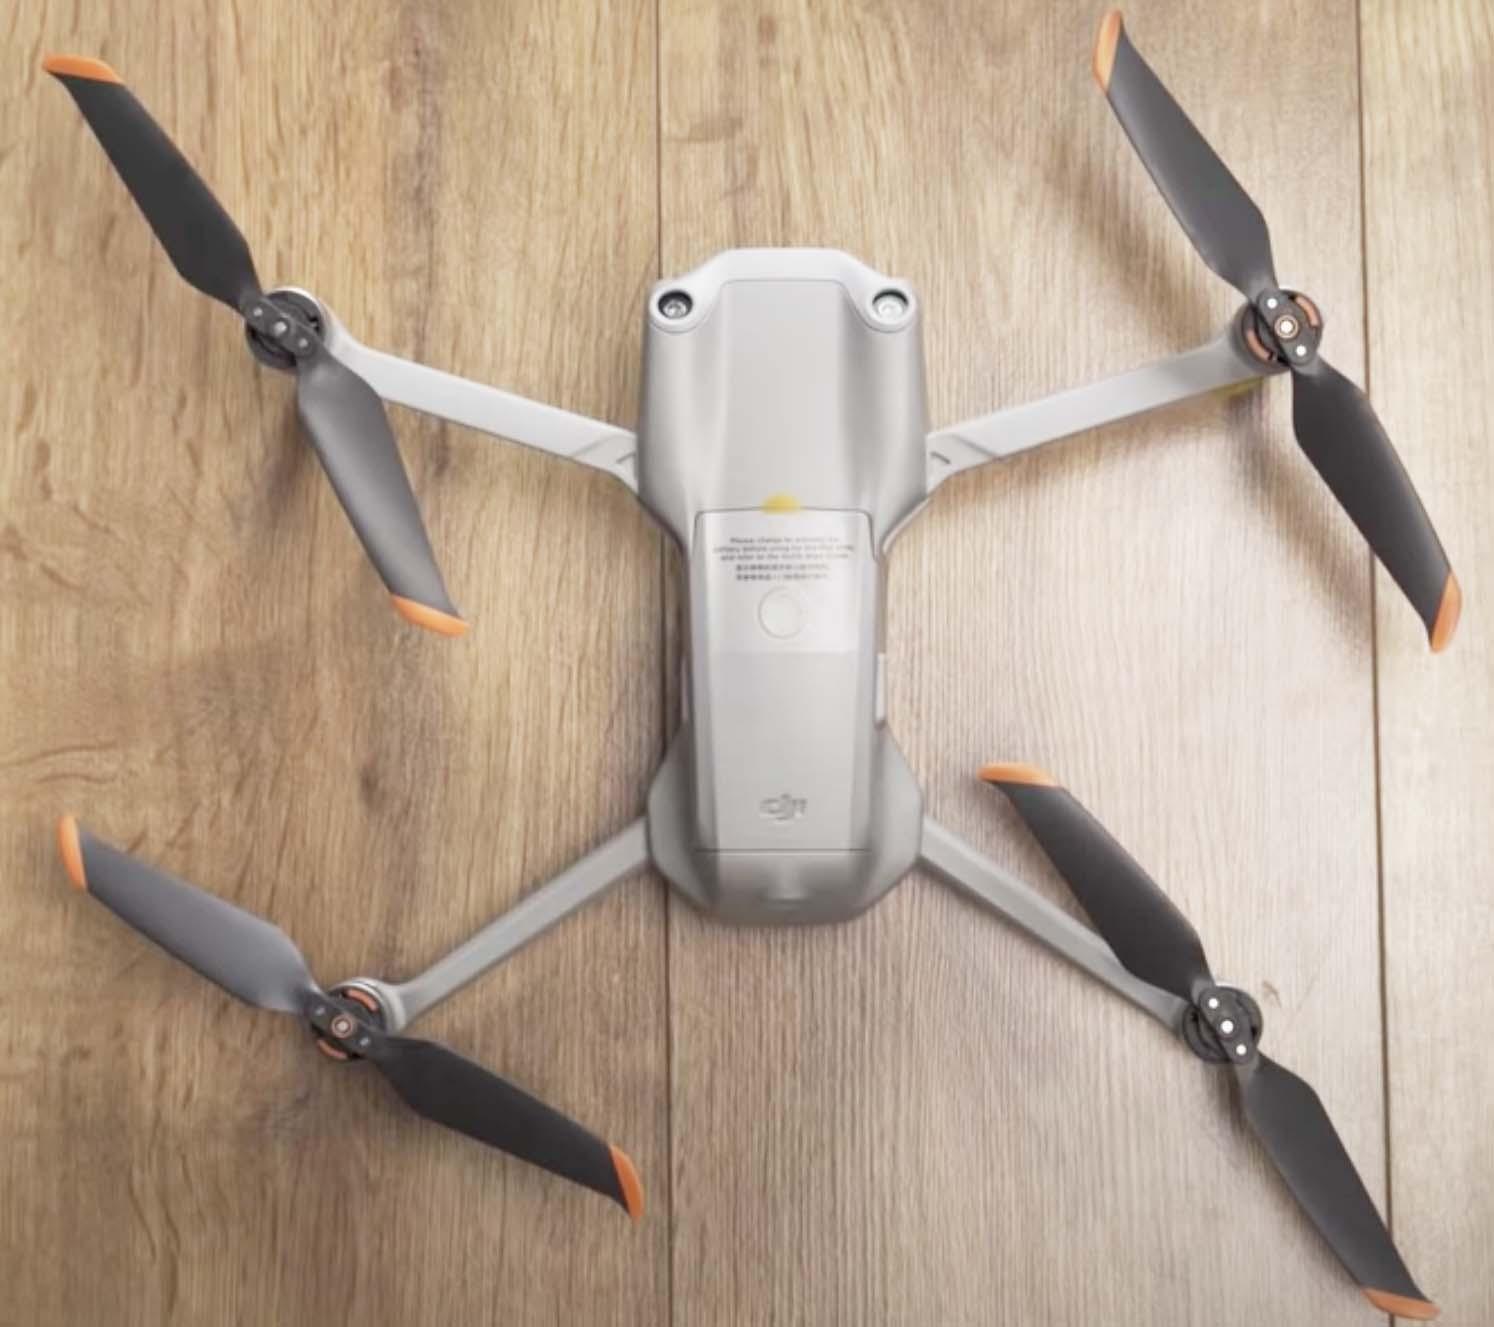 Dron od DJI